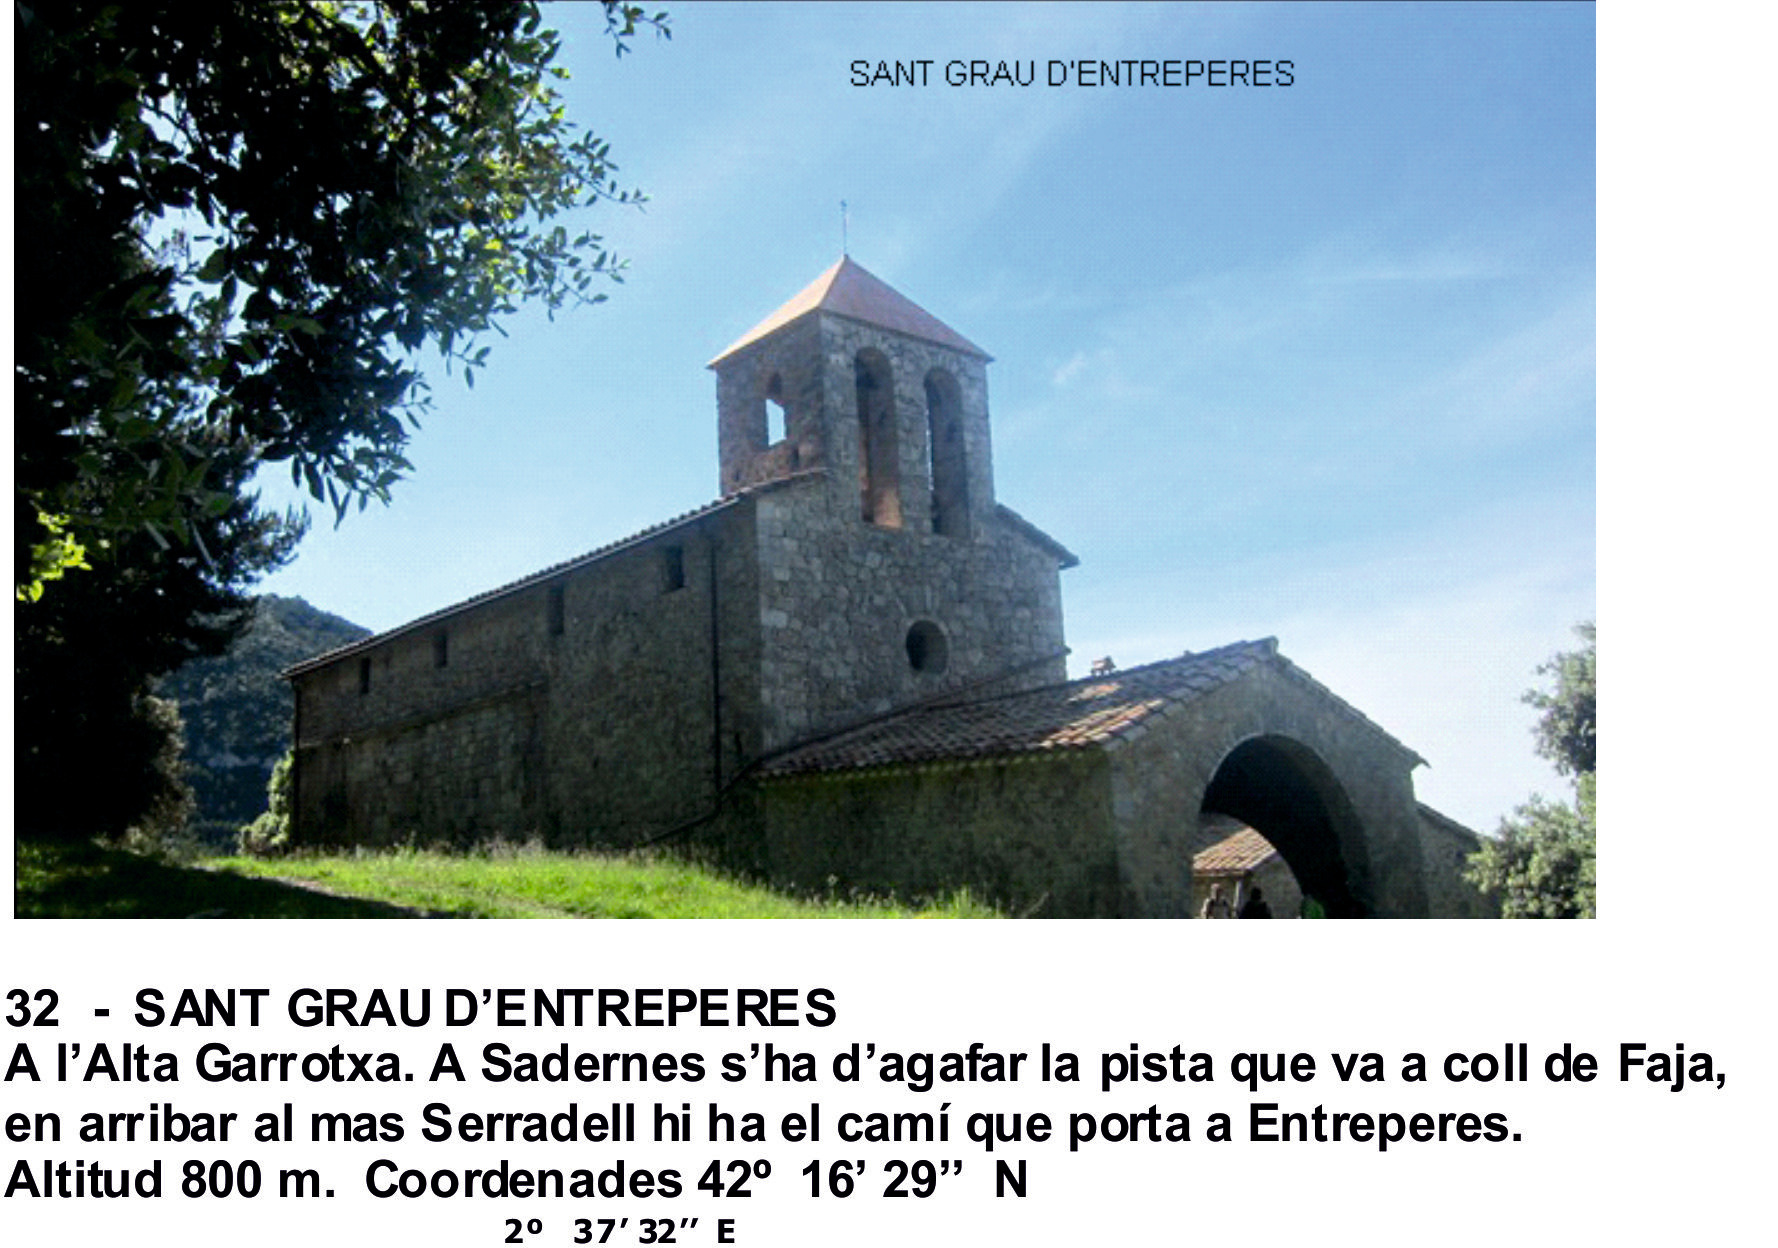 32__-__SANT_GRAU_D'ENTREPERES